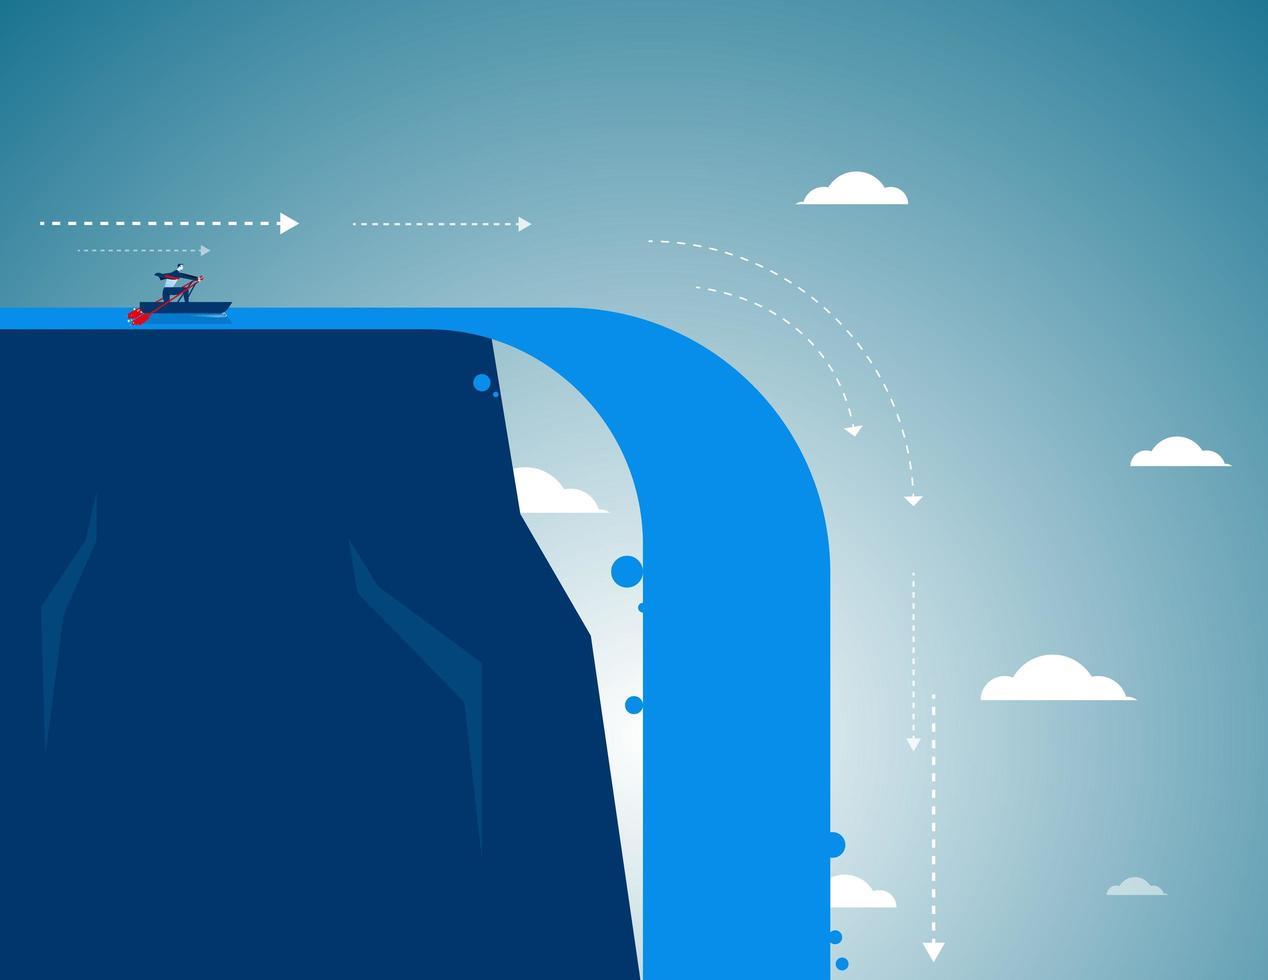 Kaufmann Rudern in Richtung Wasserfall vektor